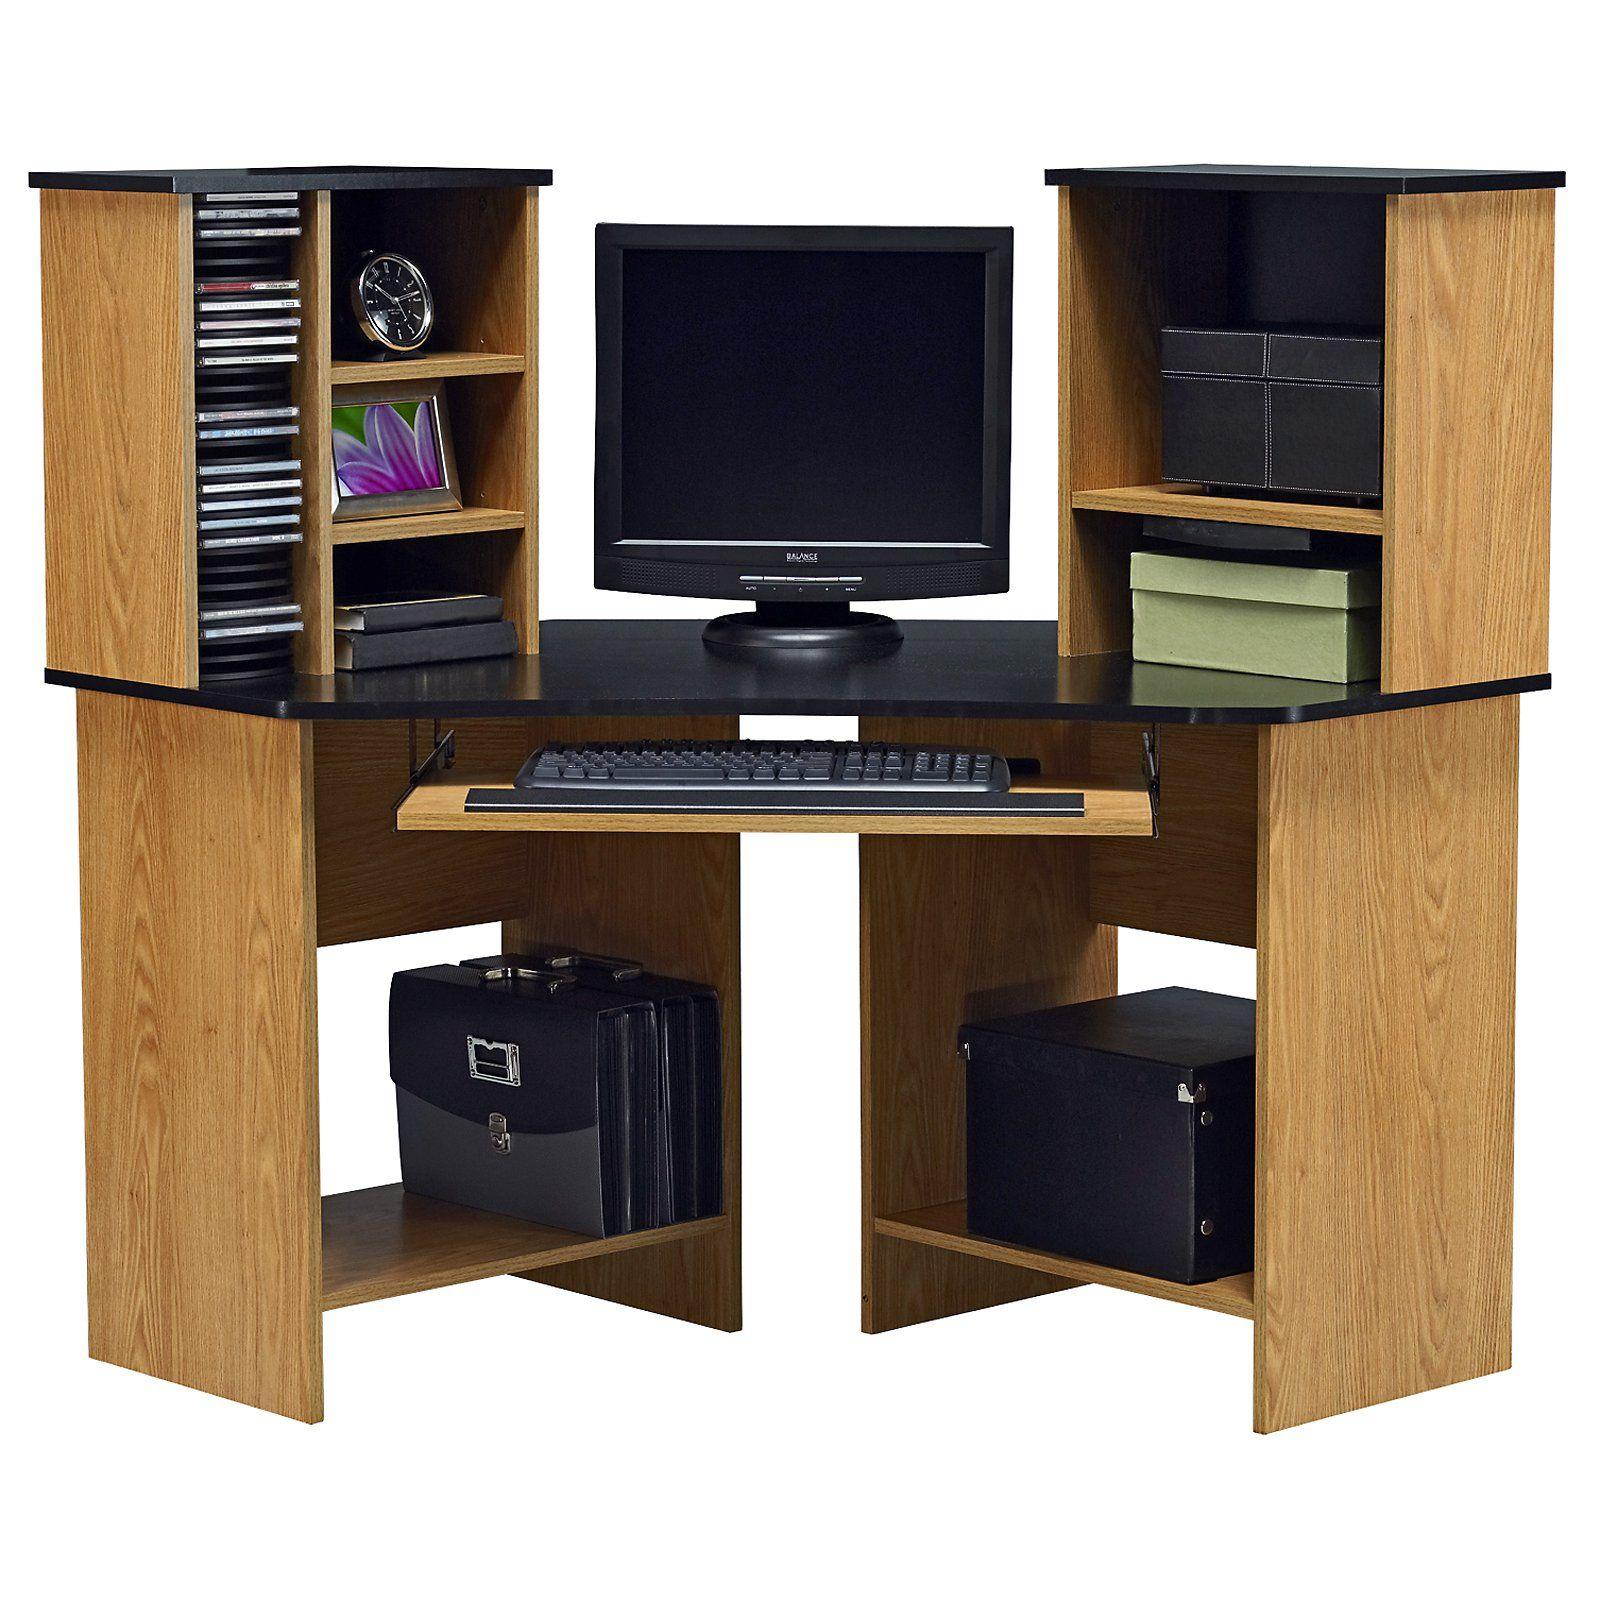 What Are The Advantages Of Corner Desk Computer Desk Design